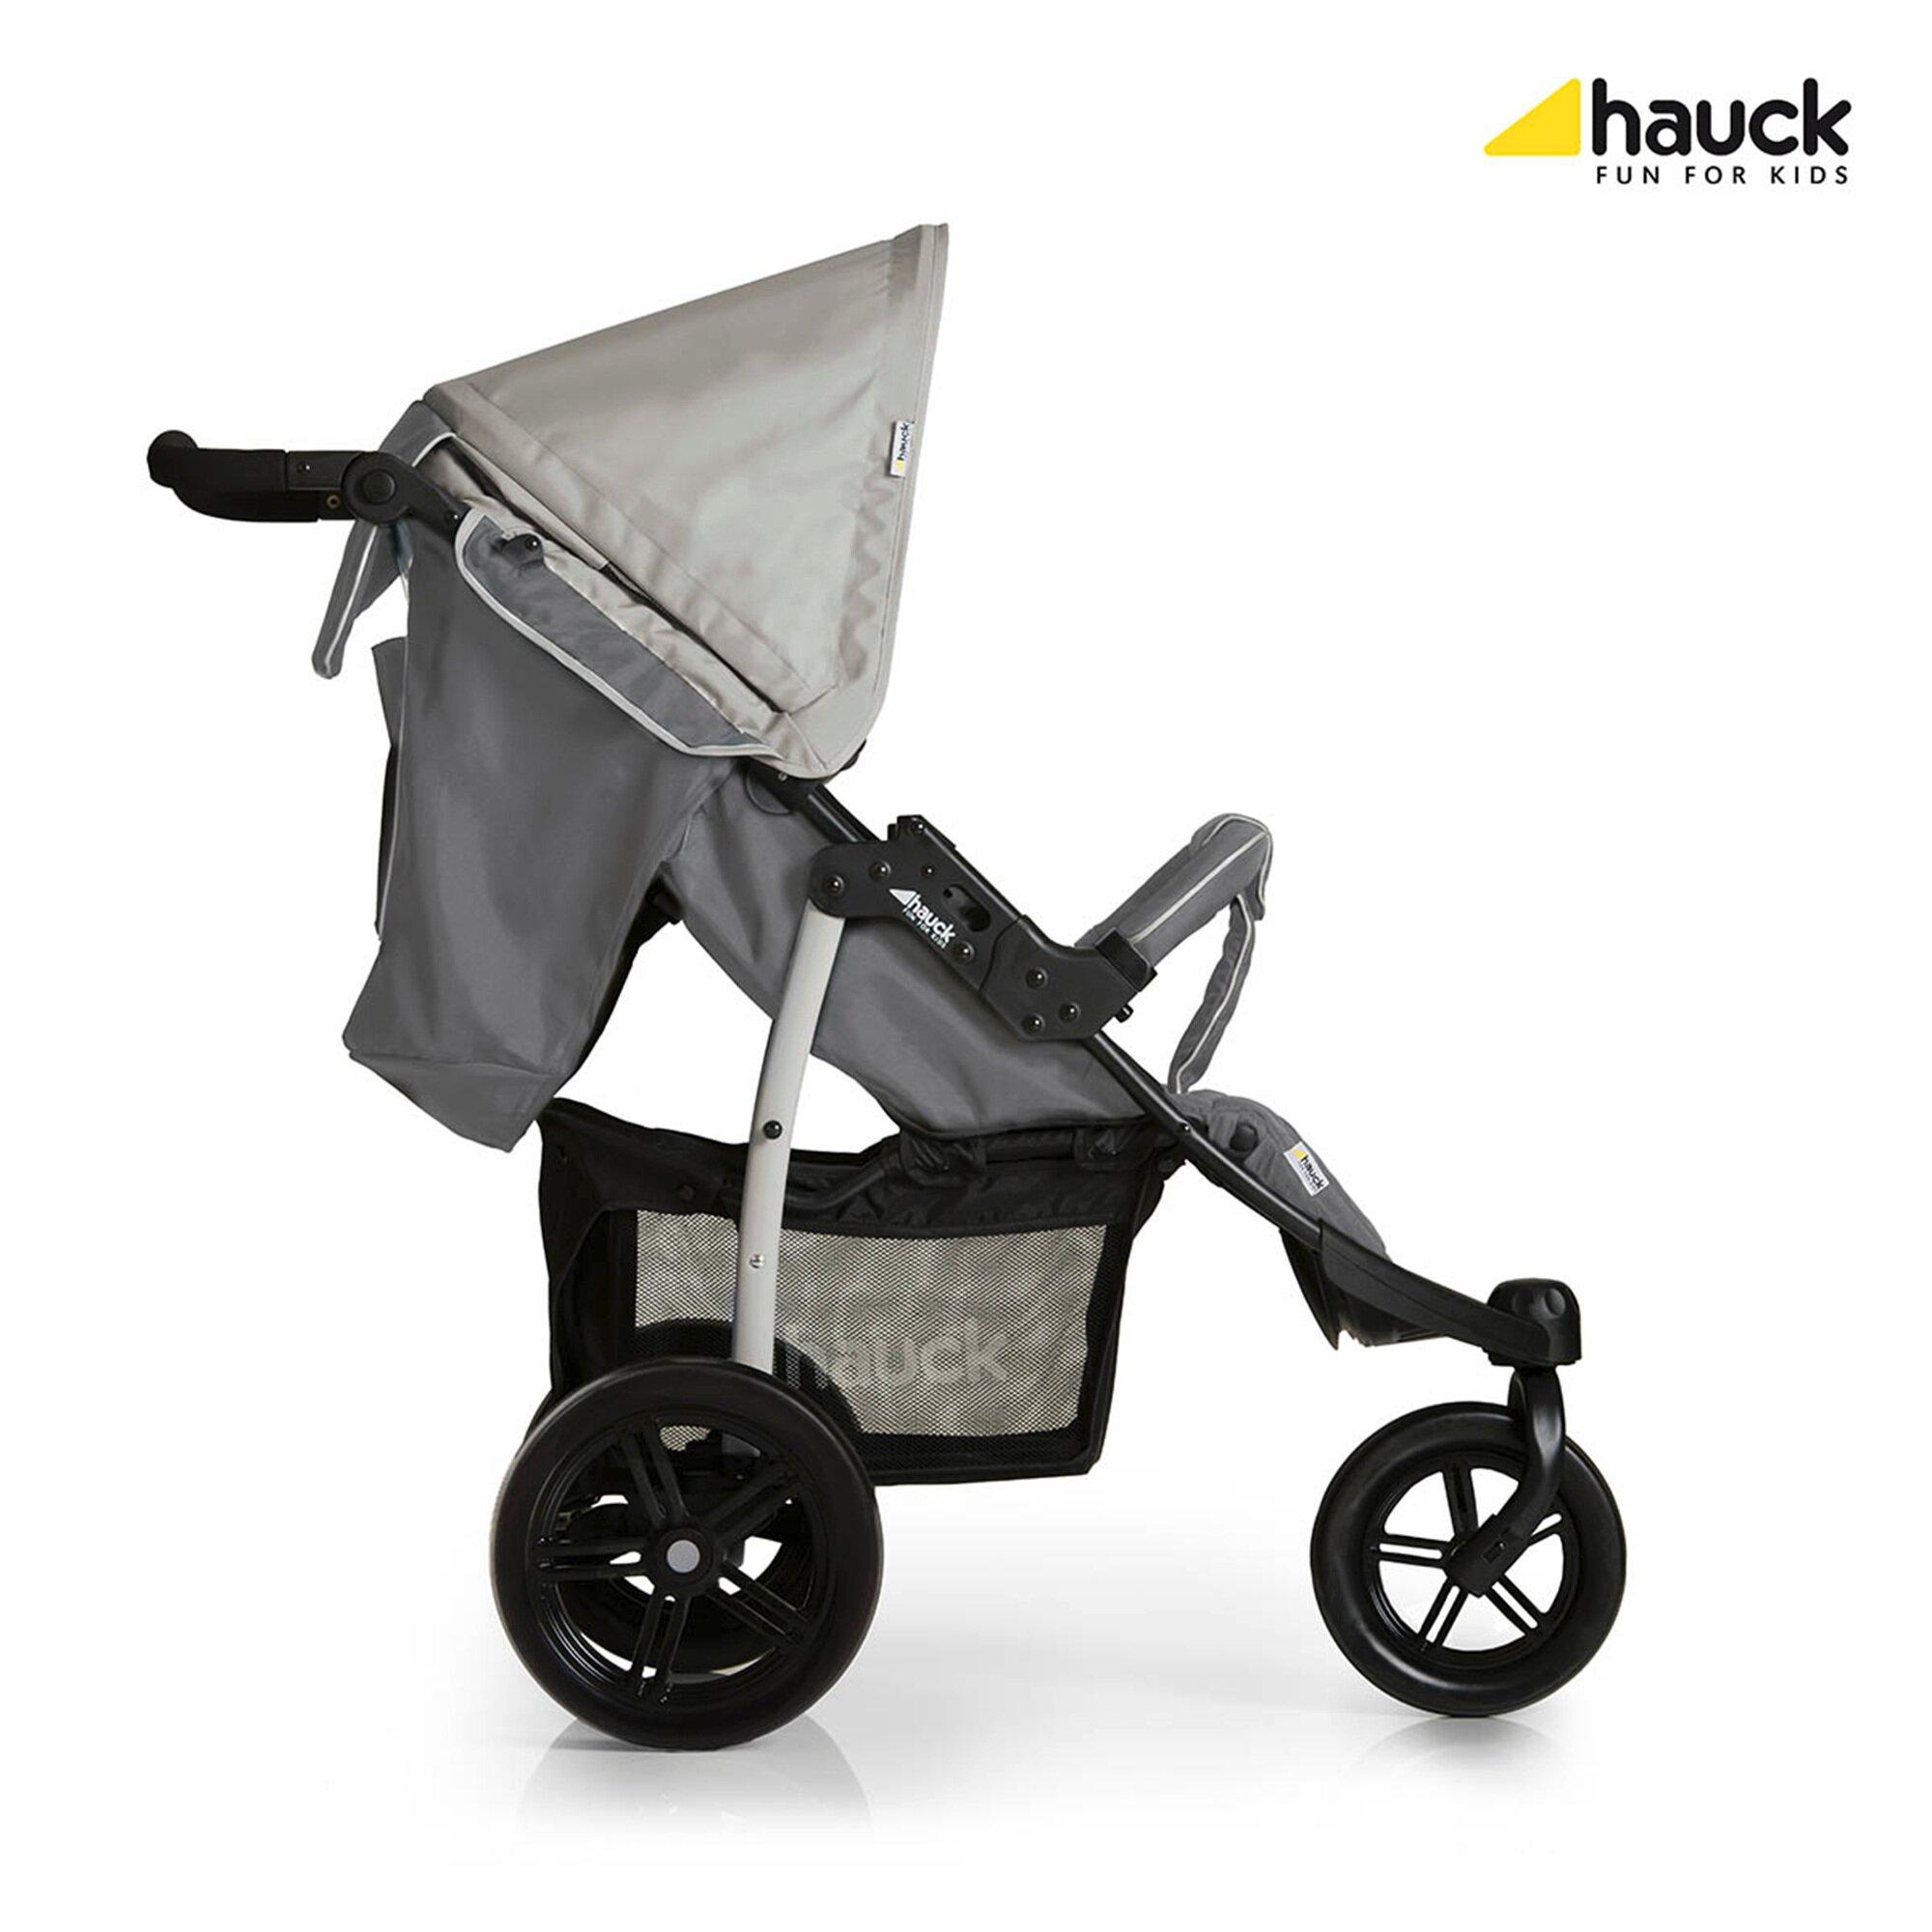 hauck-kinderwagen-sportwagen-viper-slx-design-2016-grau